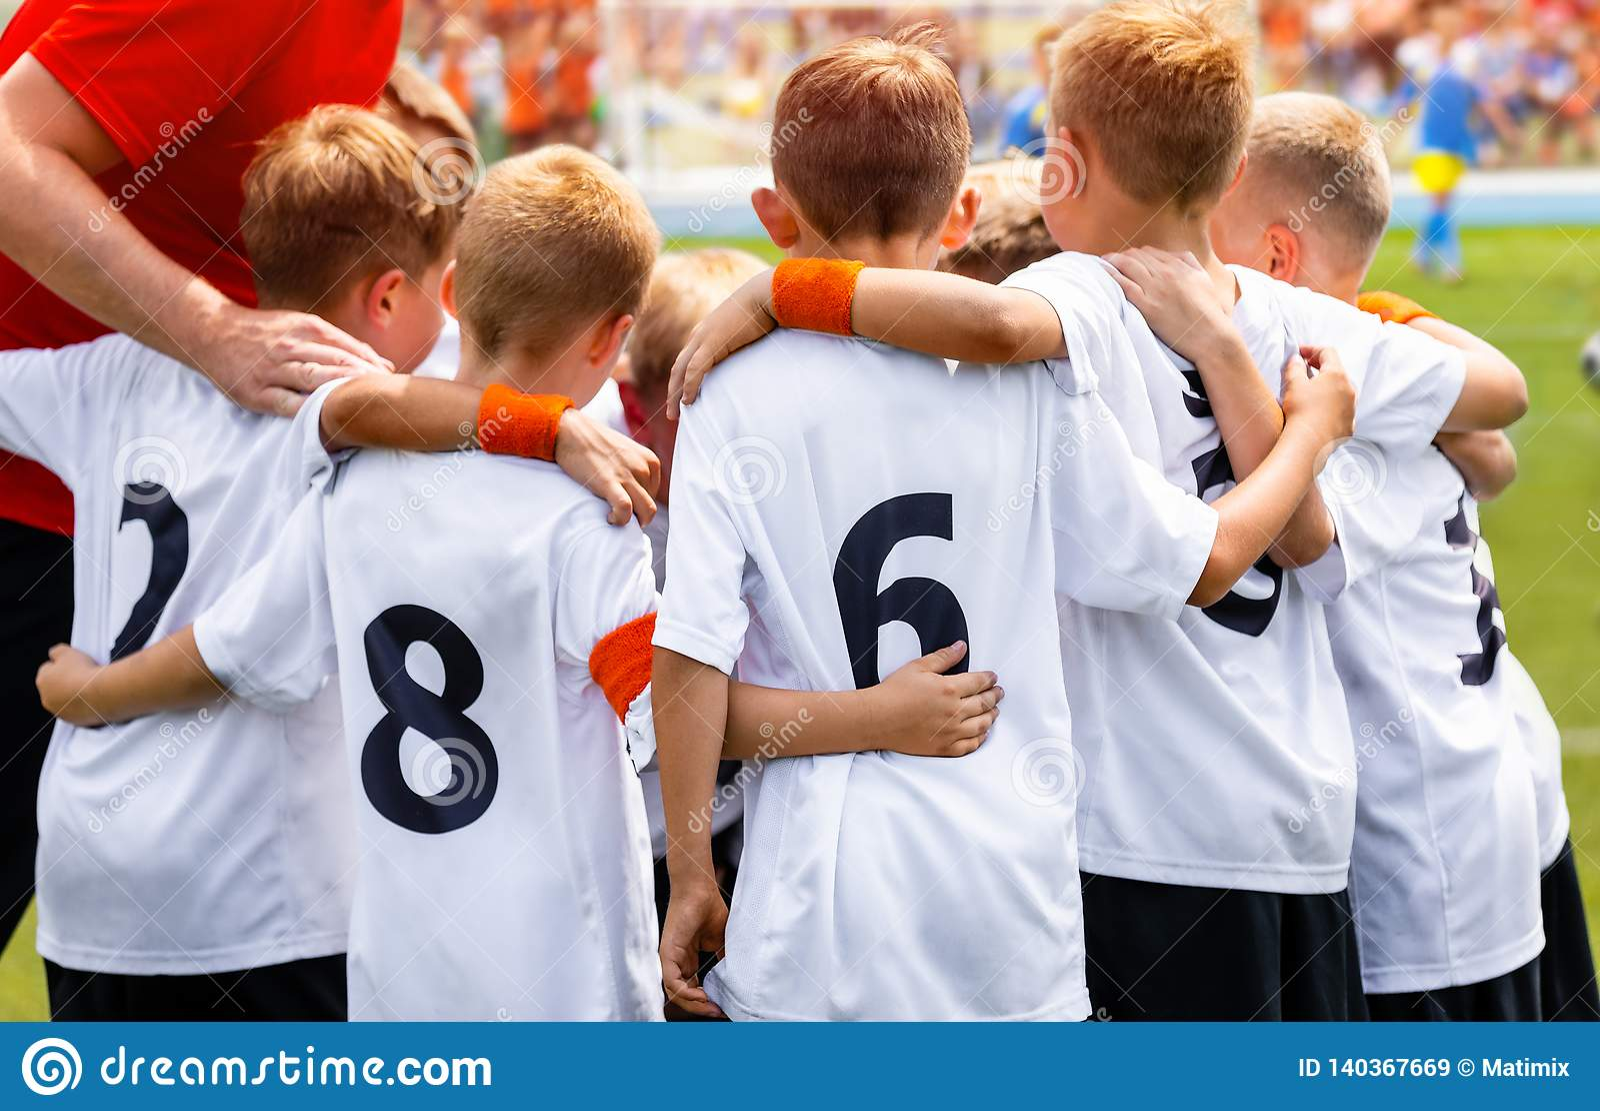 Young Boys In Football Team. Group Of Children In Soccer Team. School Football Coach's Pregame Speech